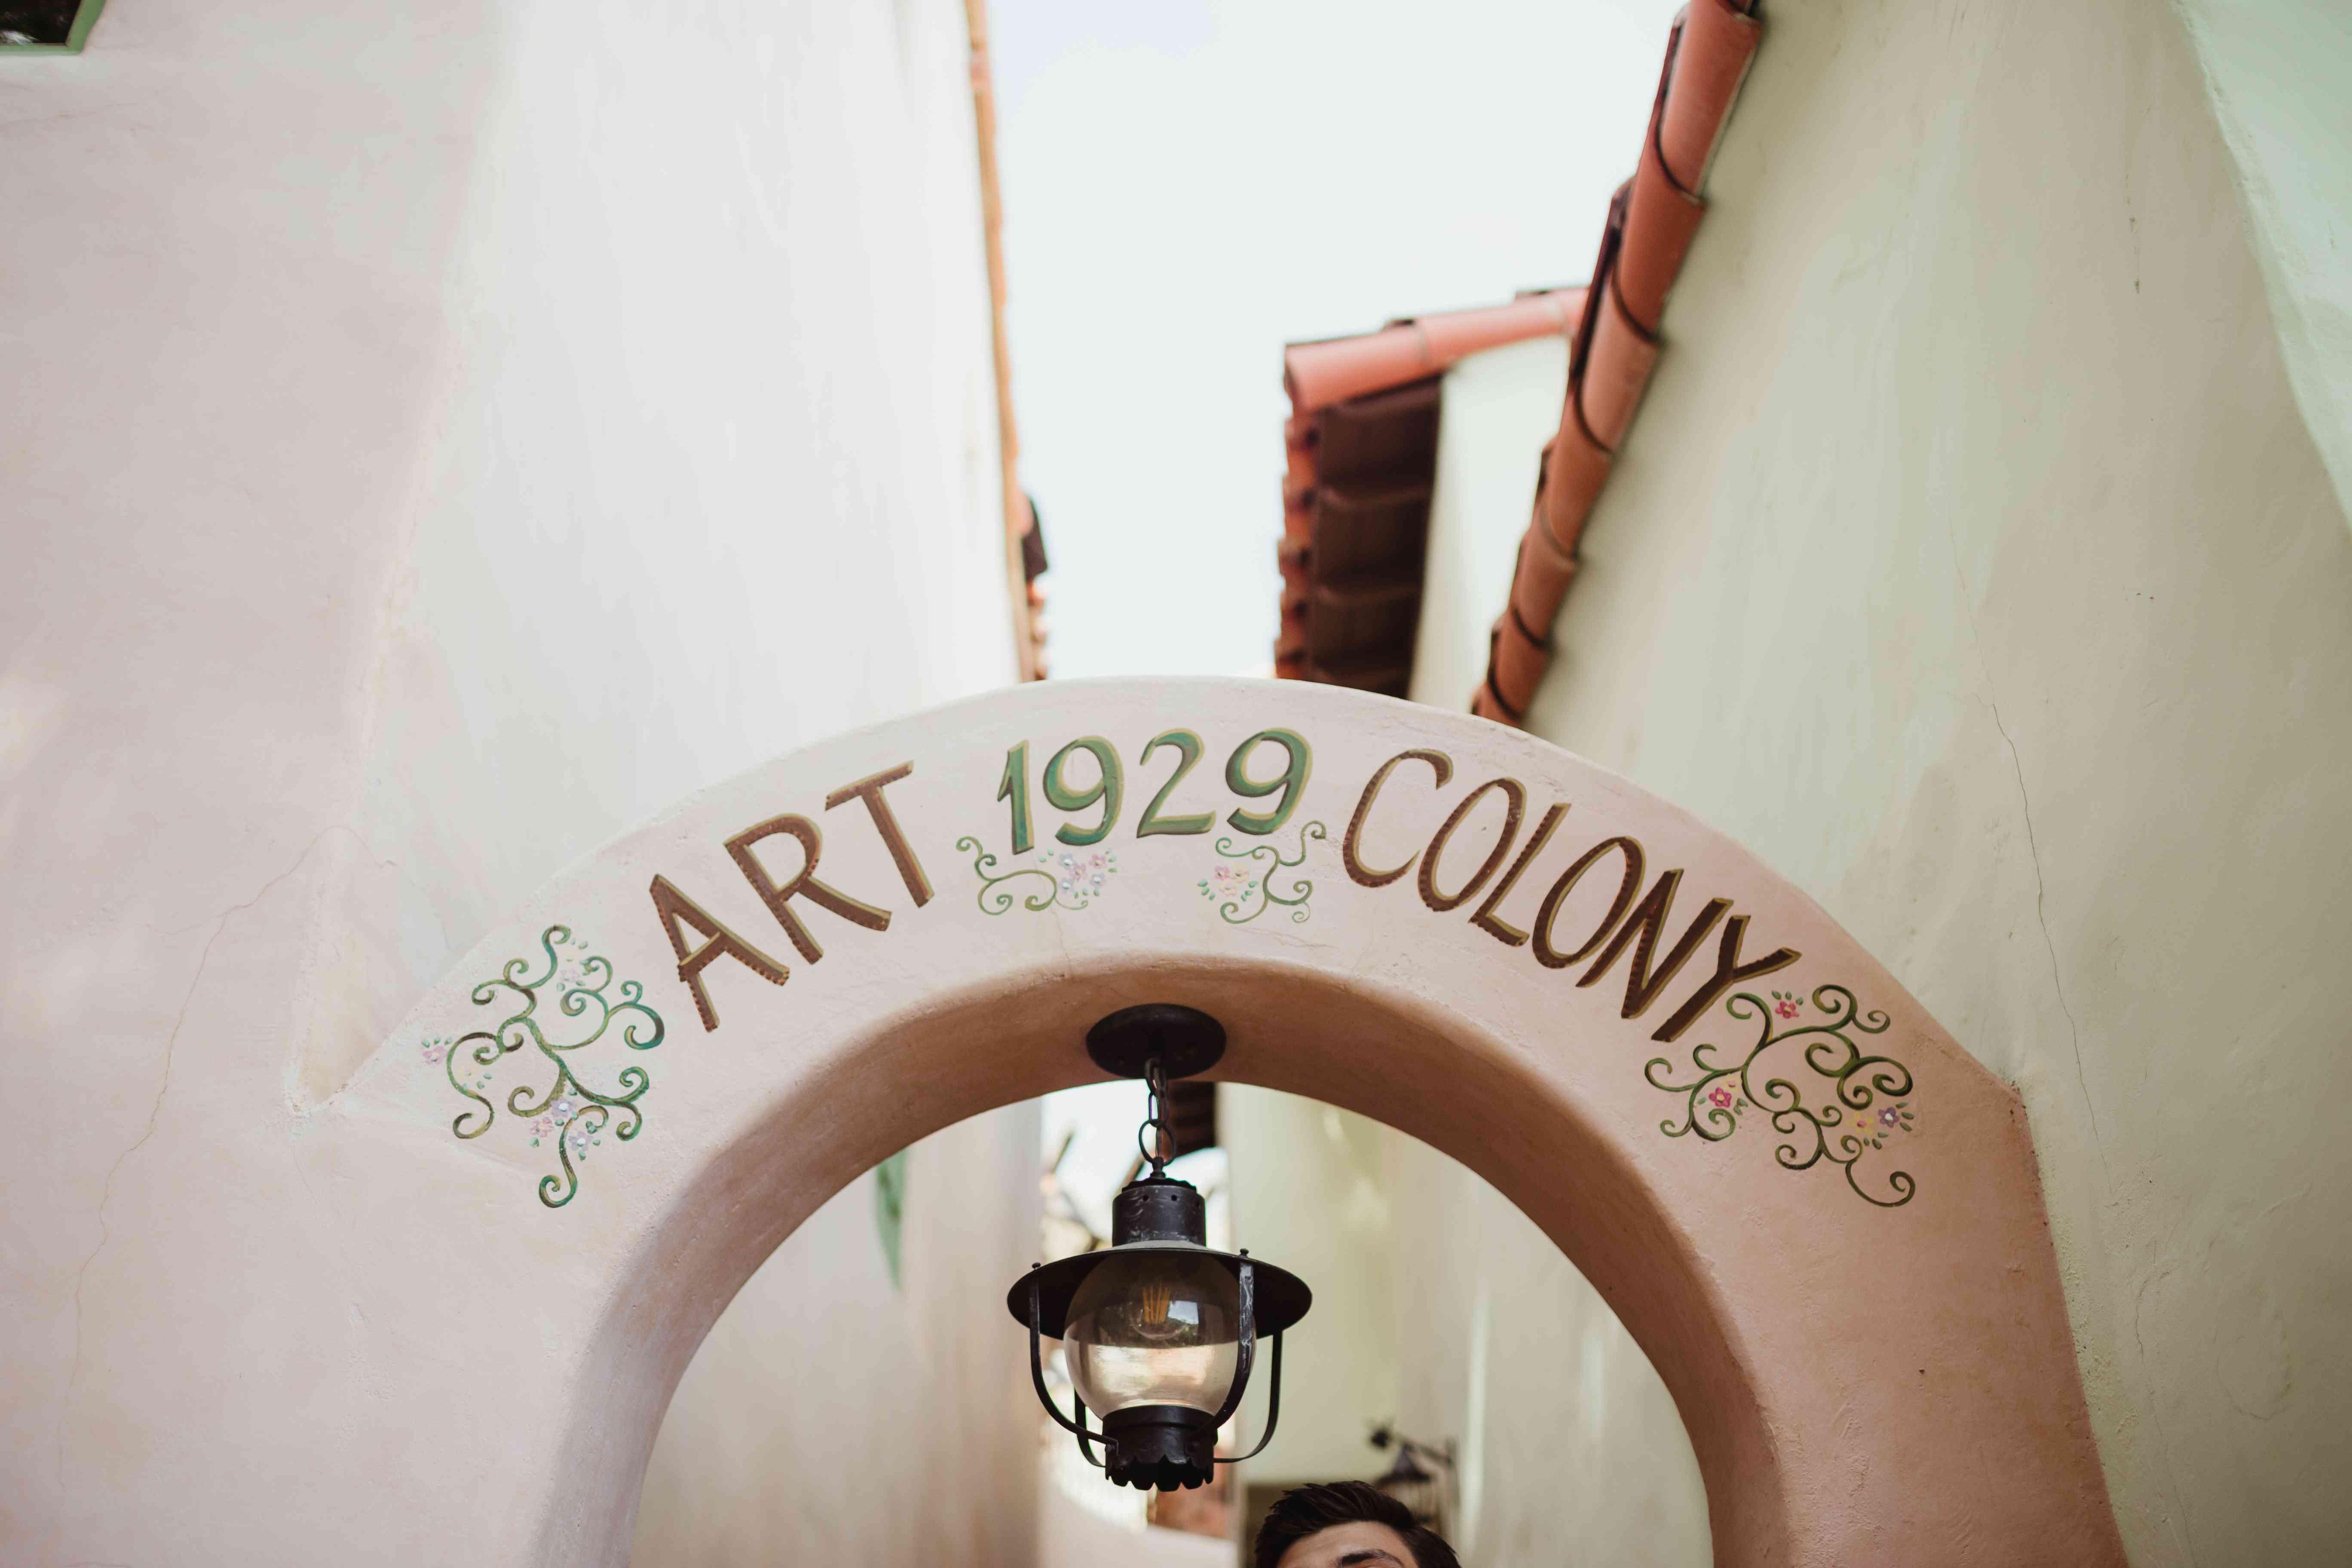 Art colony sign